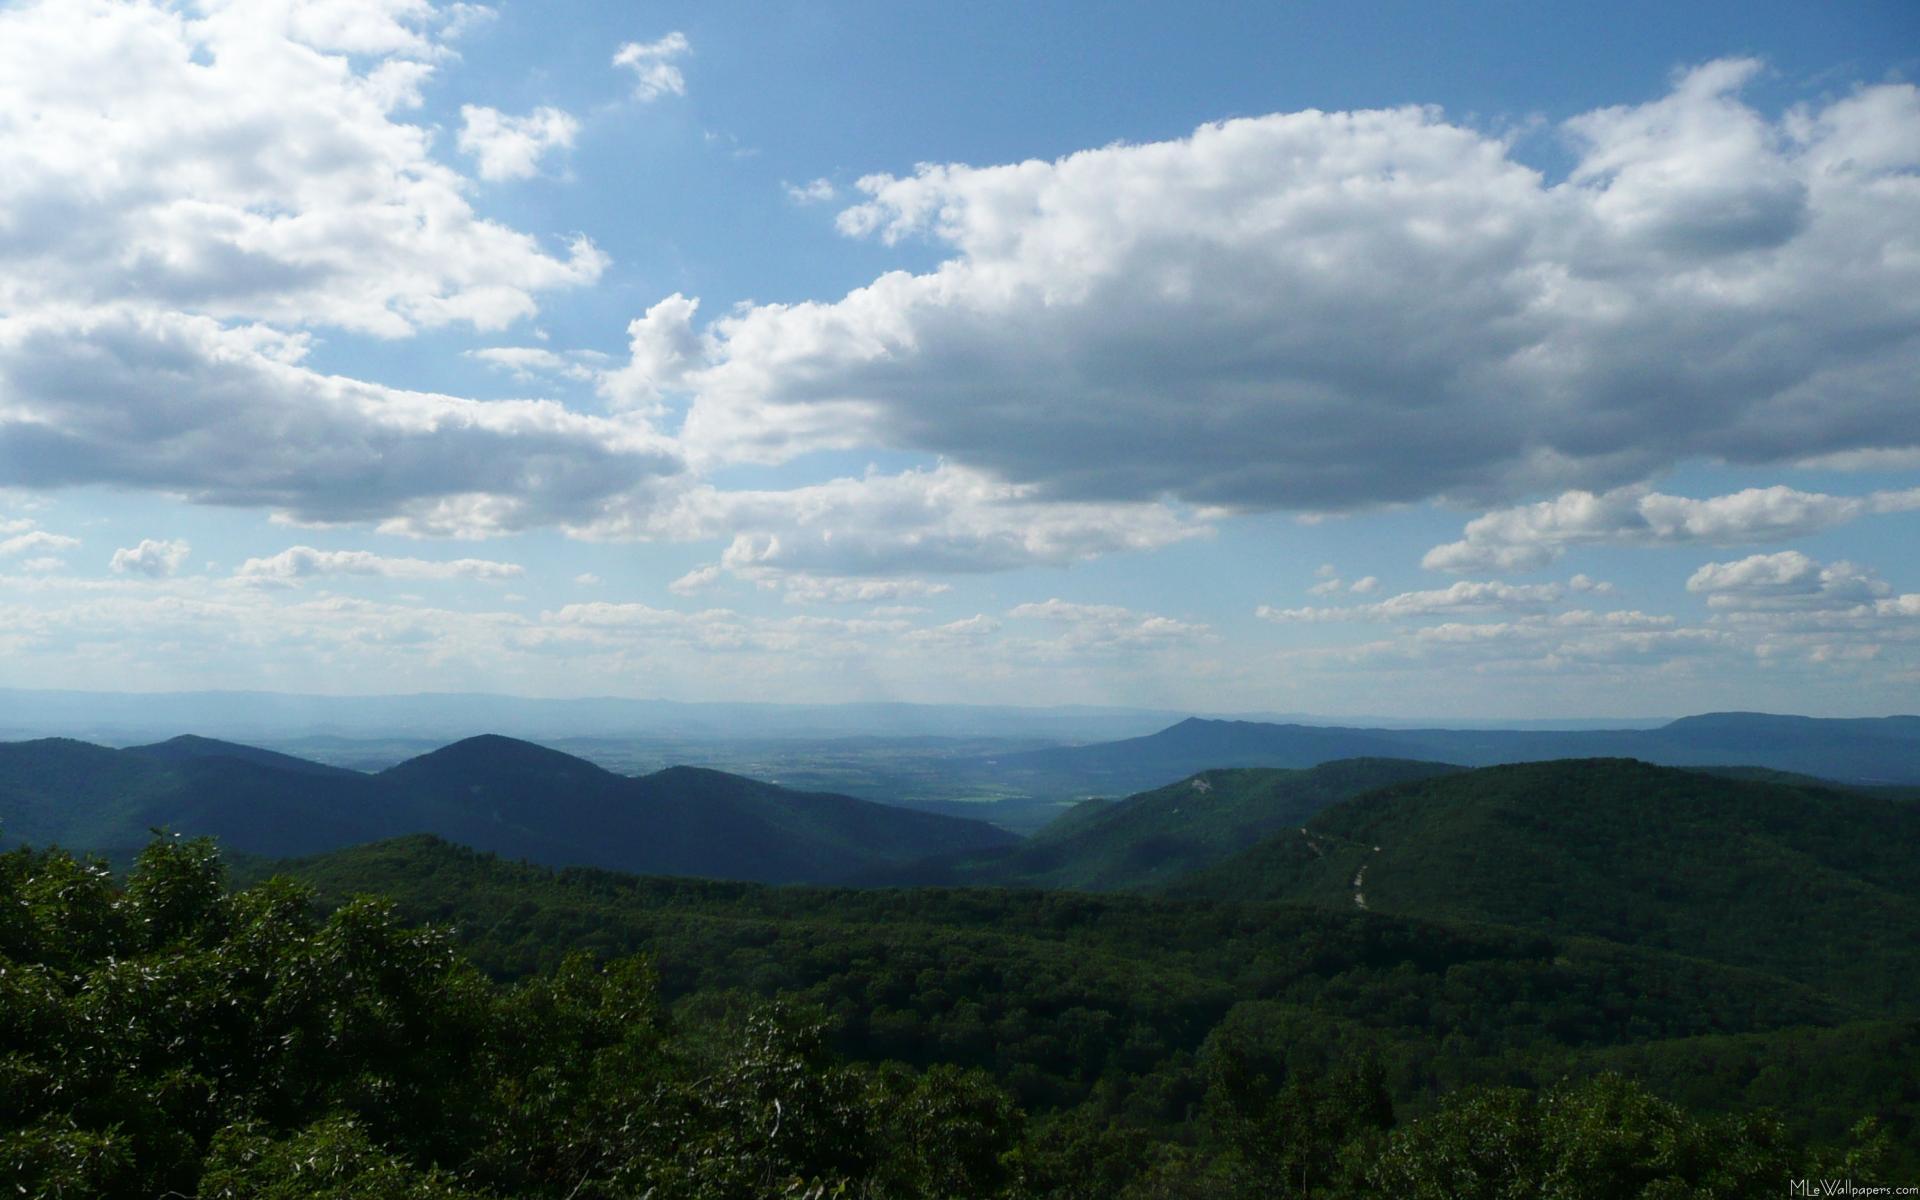 appalachian blue ridge mountains wallpaper - photo #5